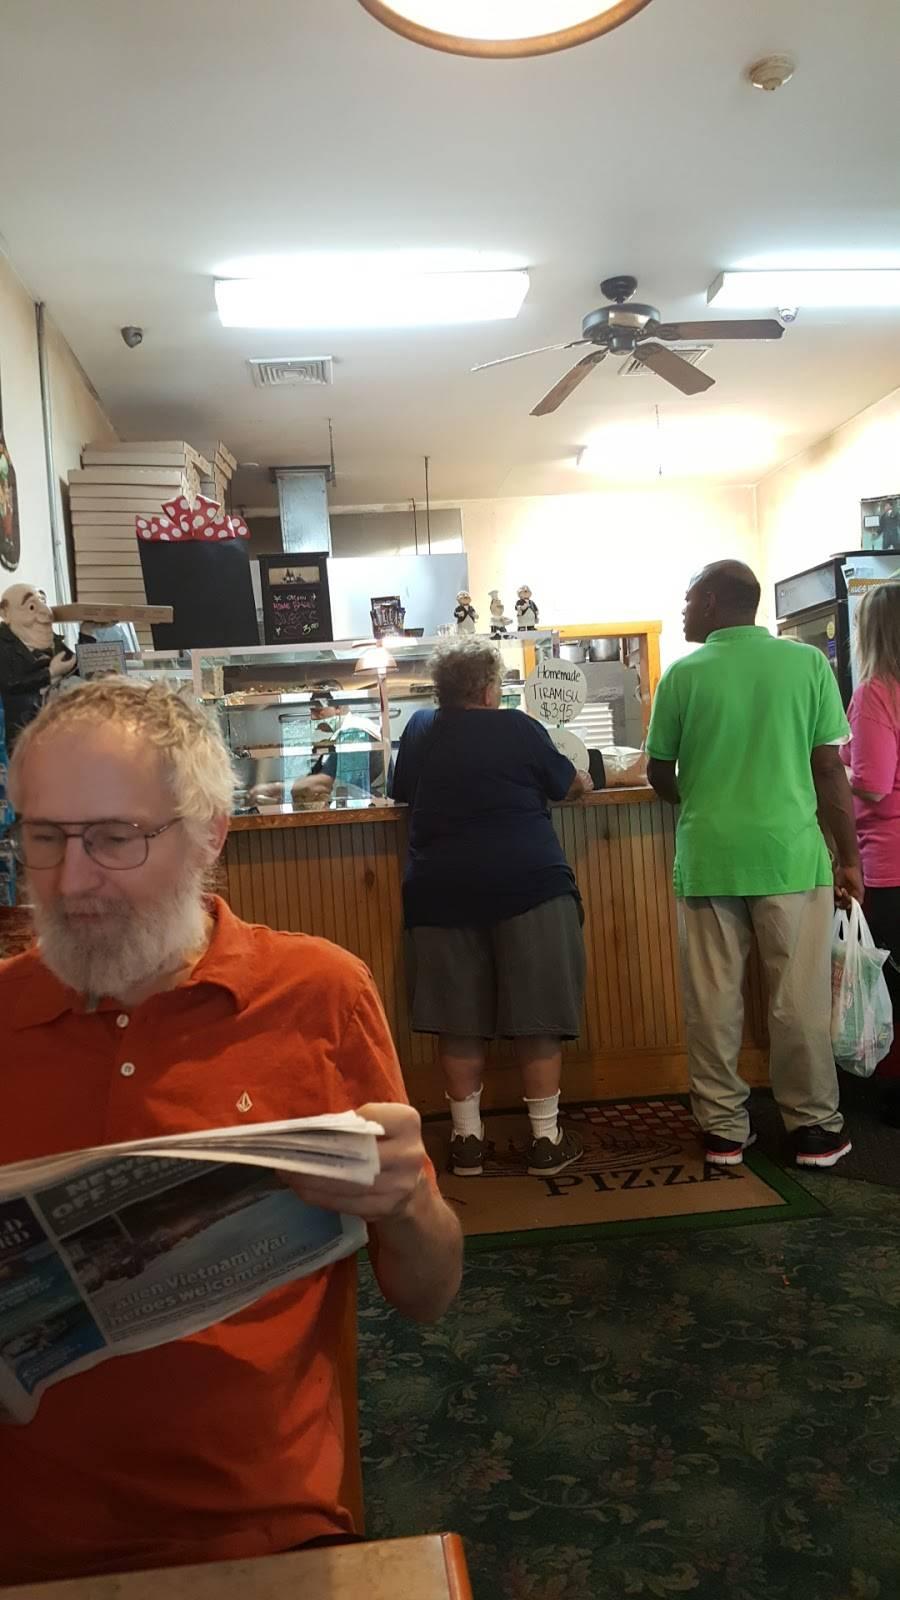 Gotta Luv It | restaurant | 187 Kingston Ave, Wurtsboro, NY 12790, USA | 8458884222 OR +1 845-888-4222